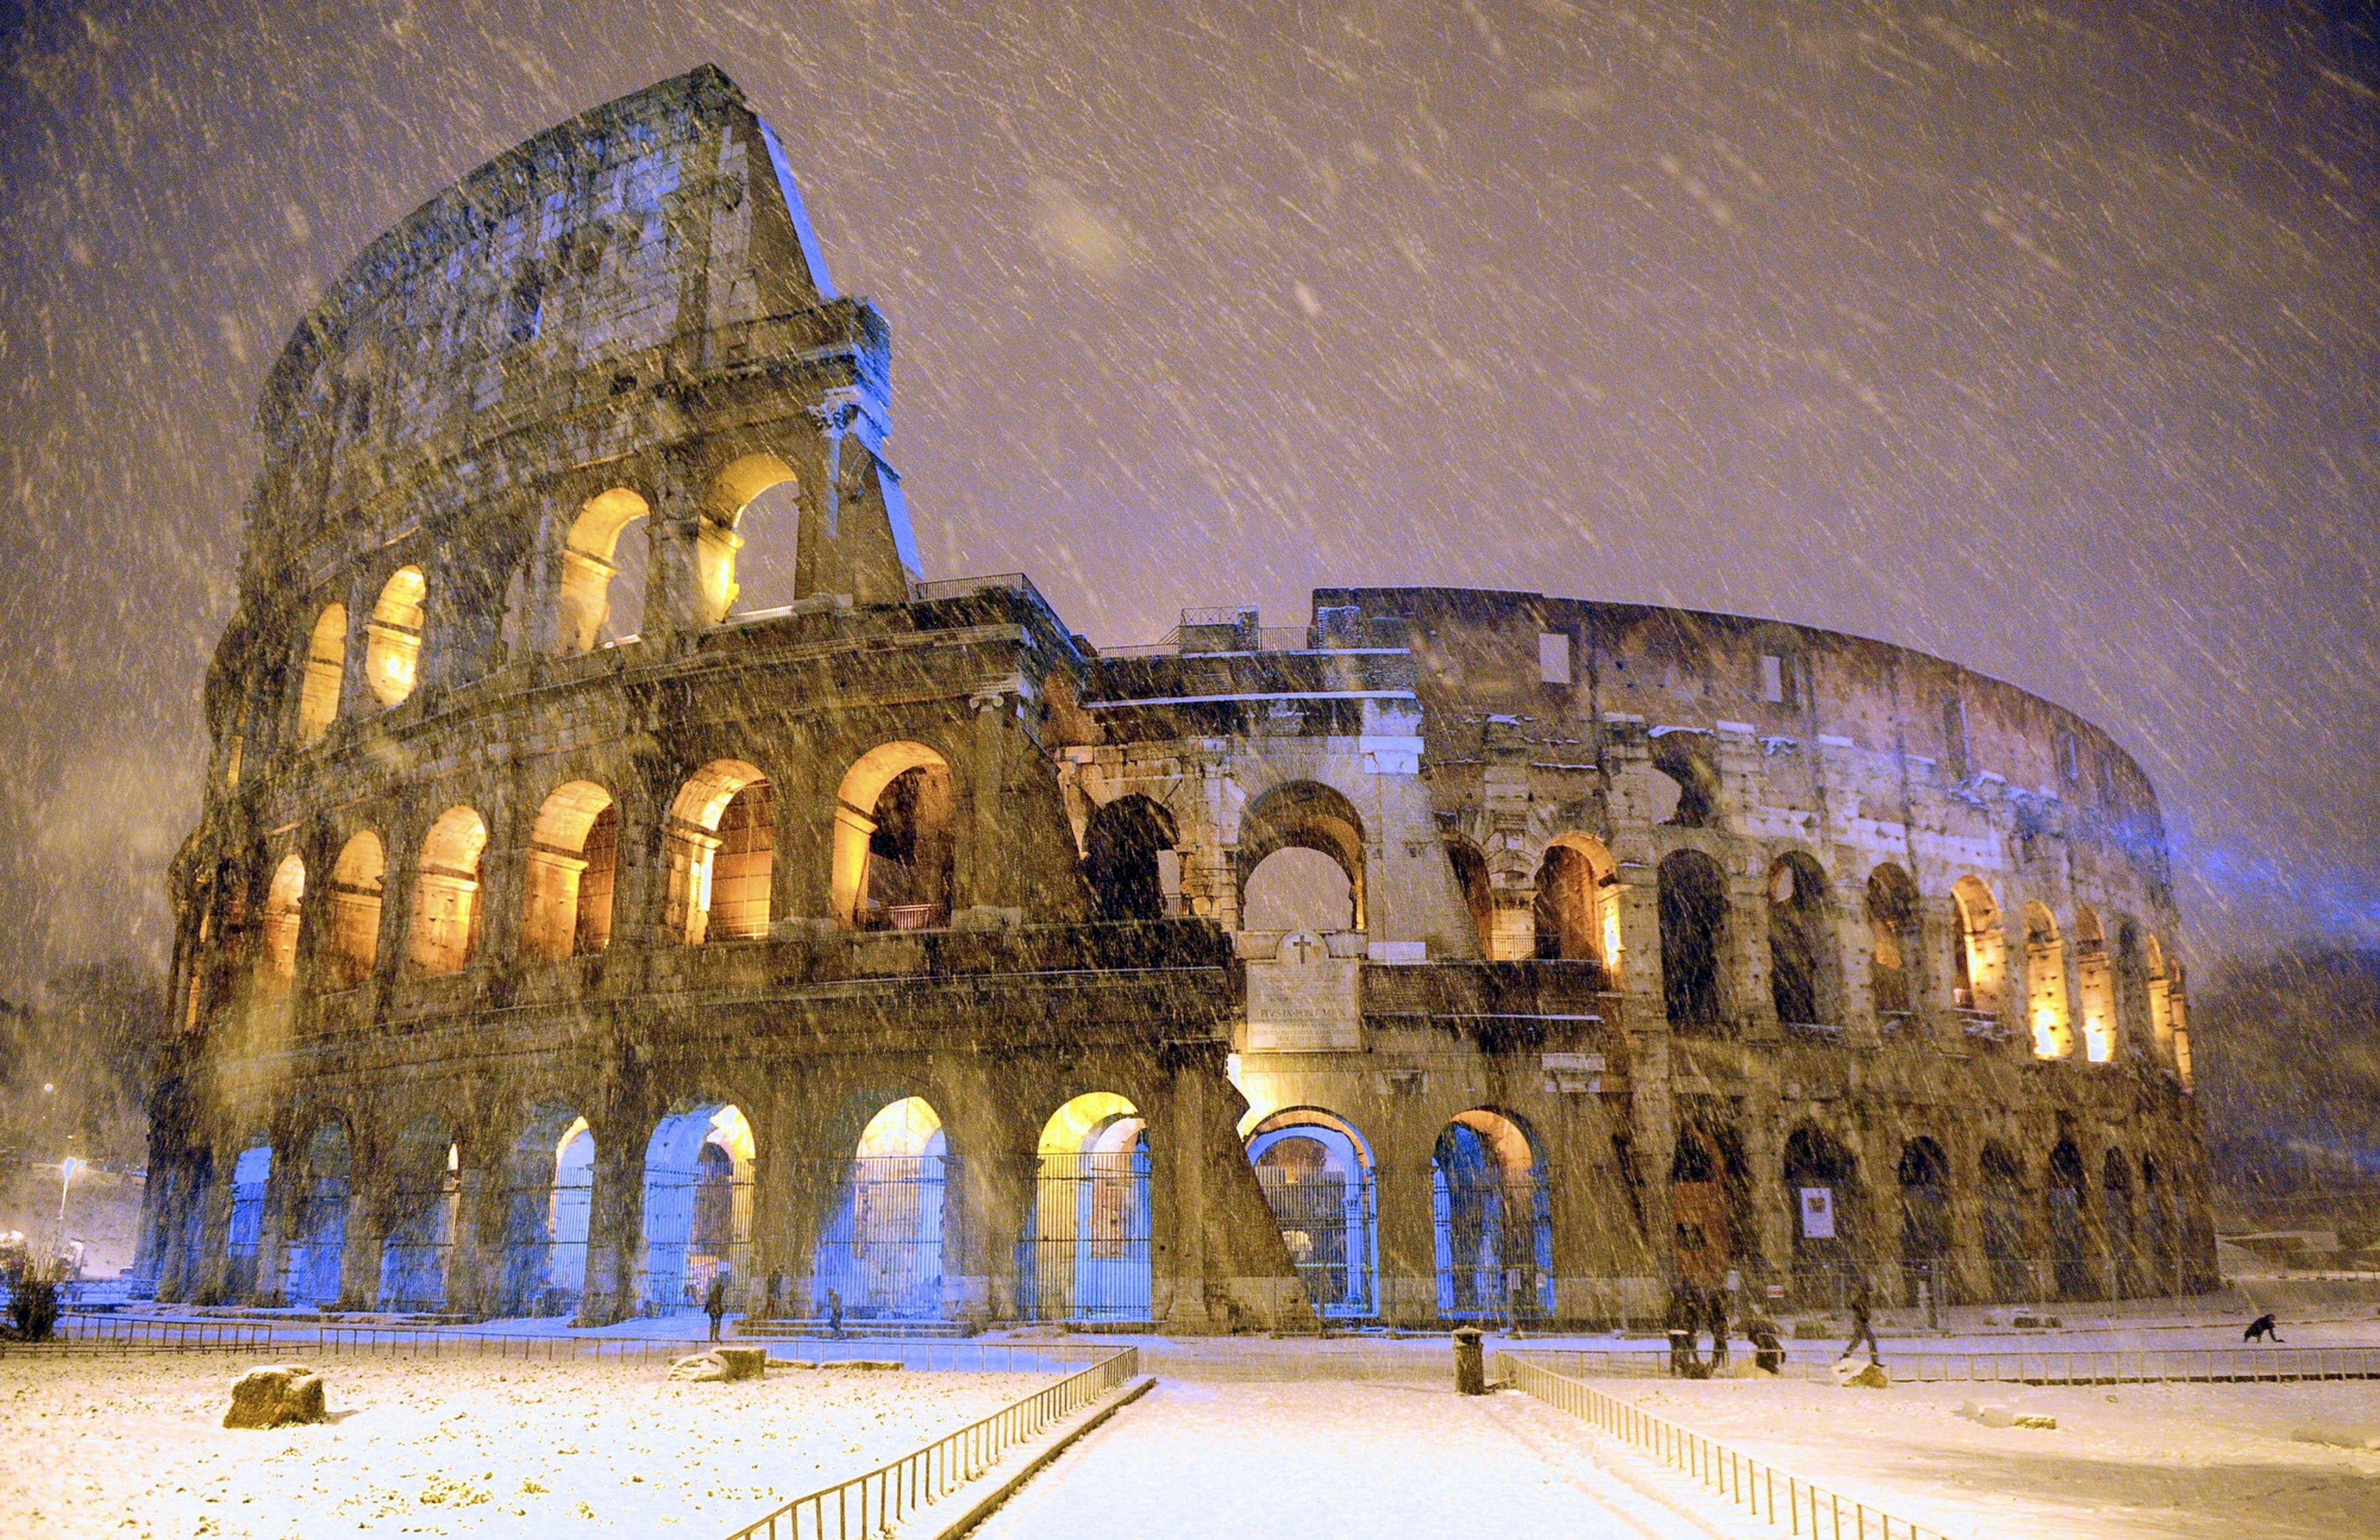 Most Inspiring Wallpaper Night Colosseum - Snowfall-Wallpapers-13-3500-x-2265  Trends.jpg